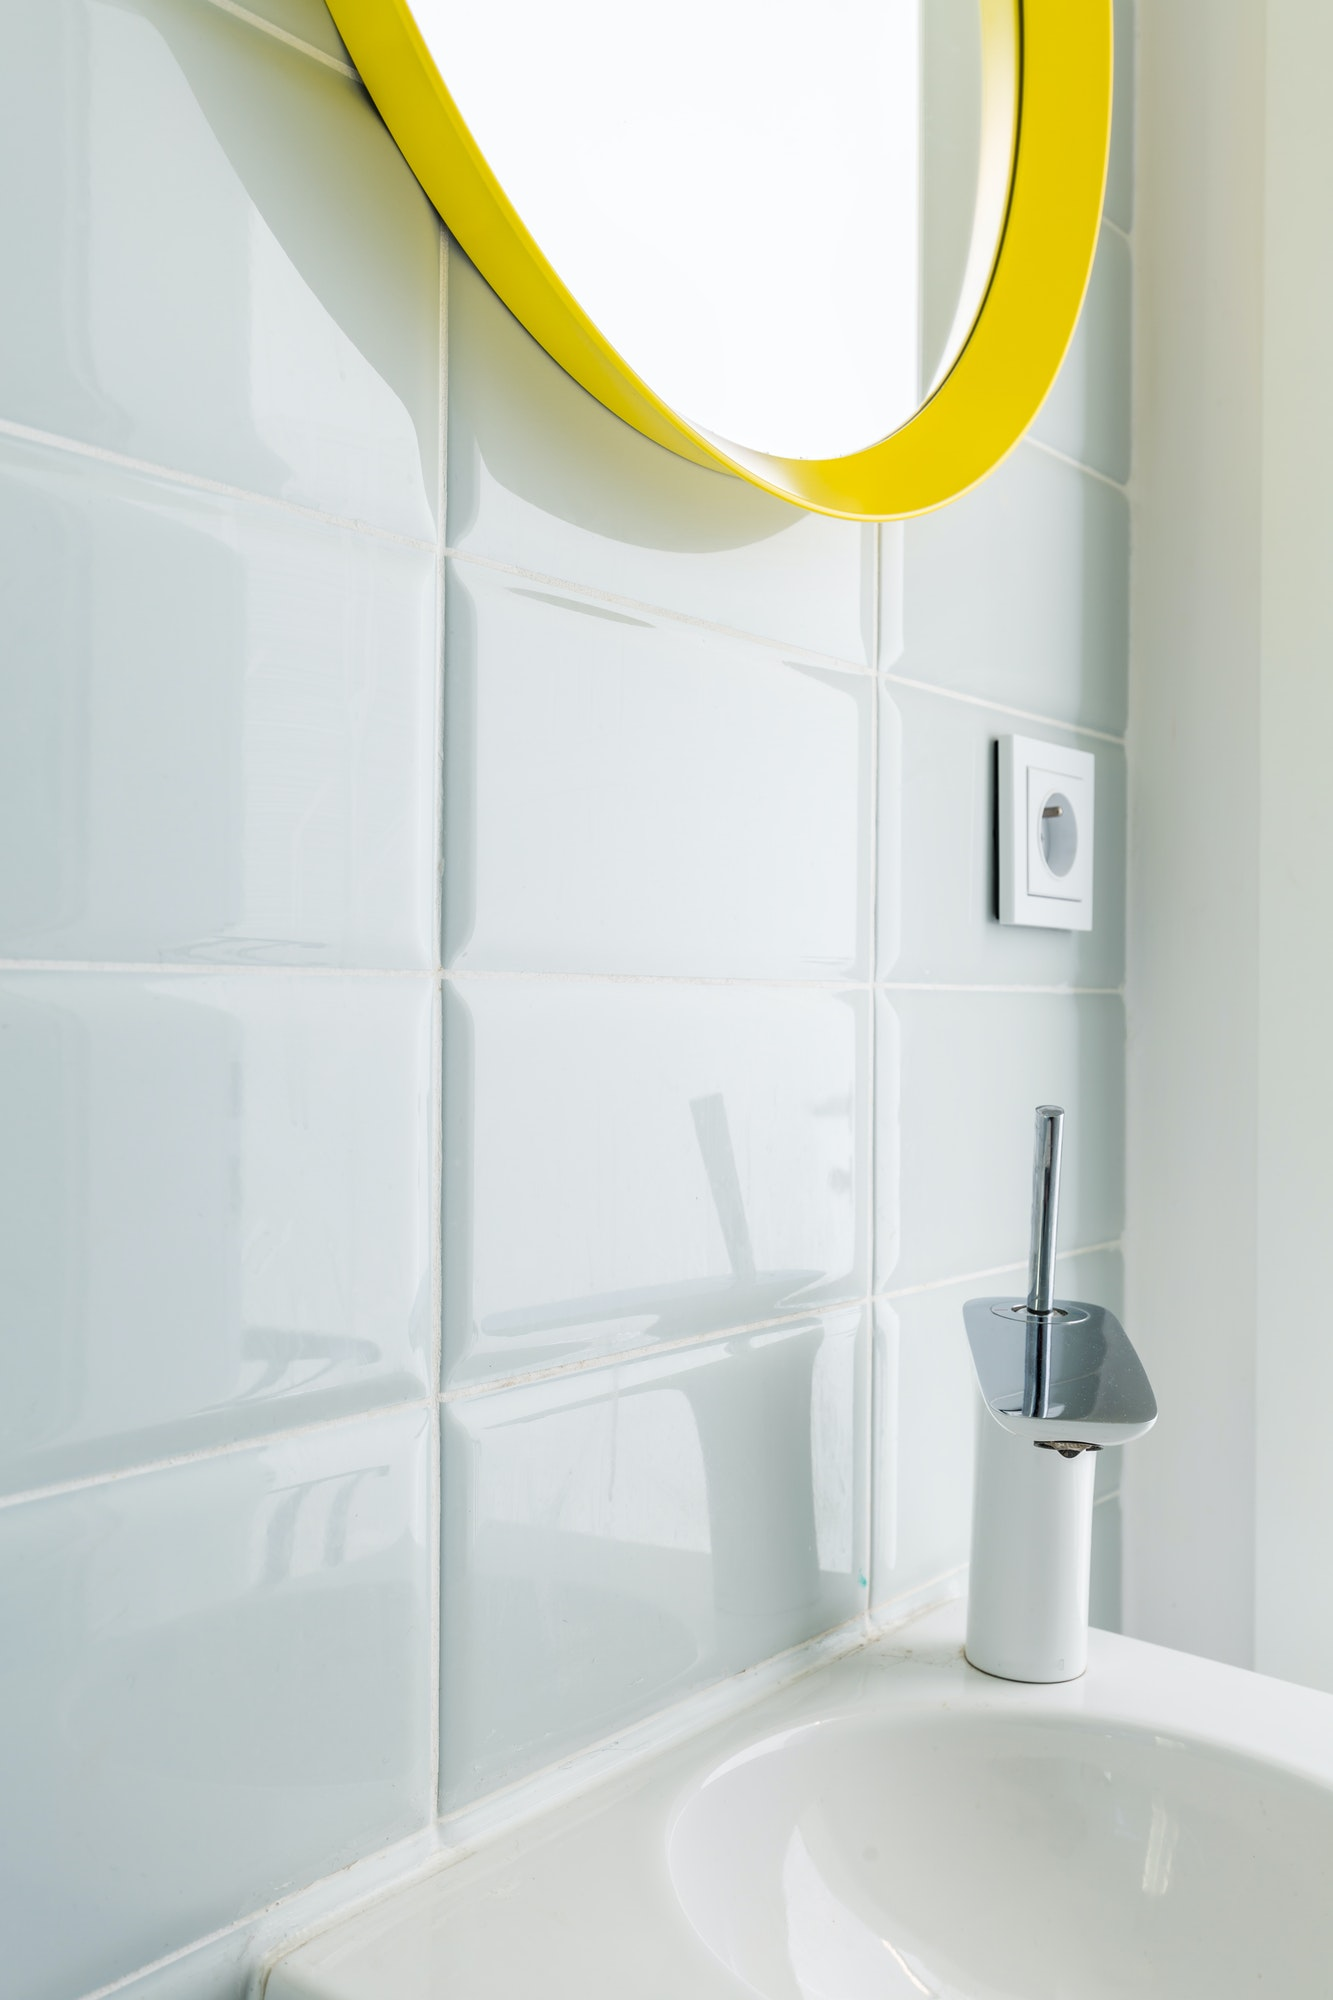 White bathroom with yellow mirror